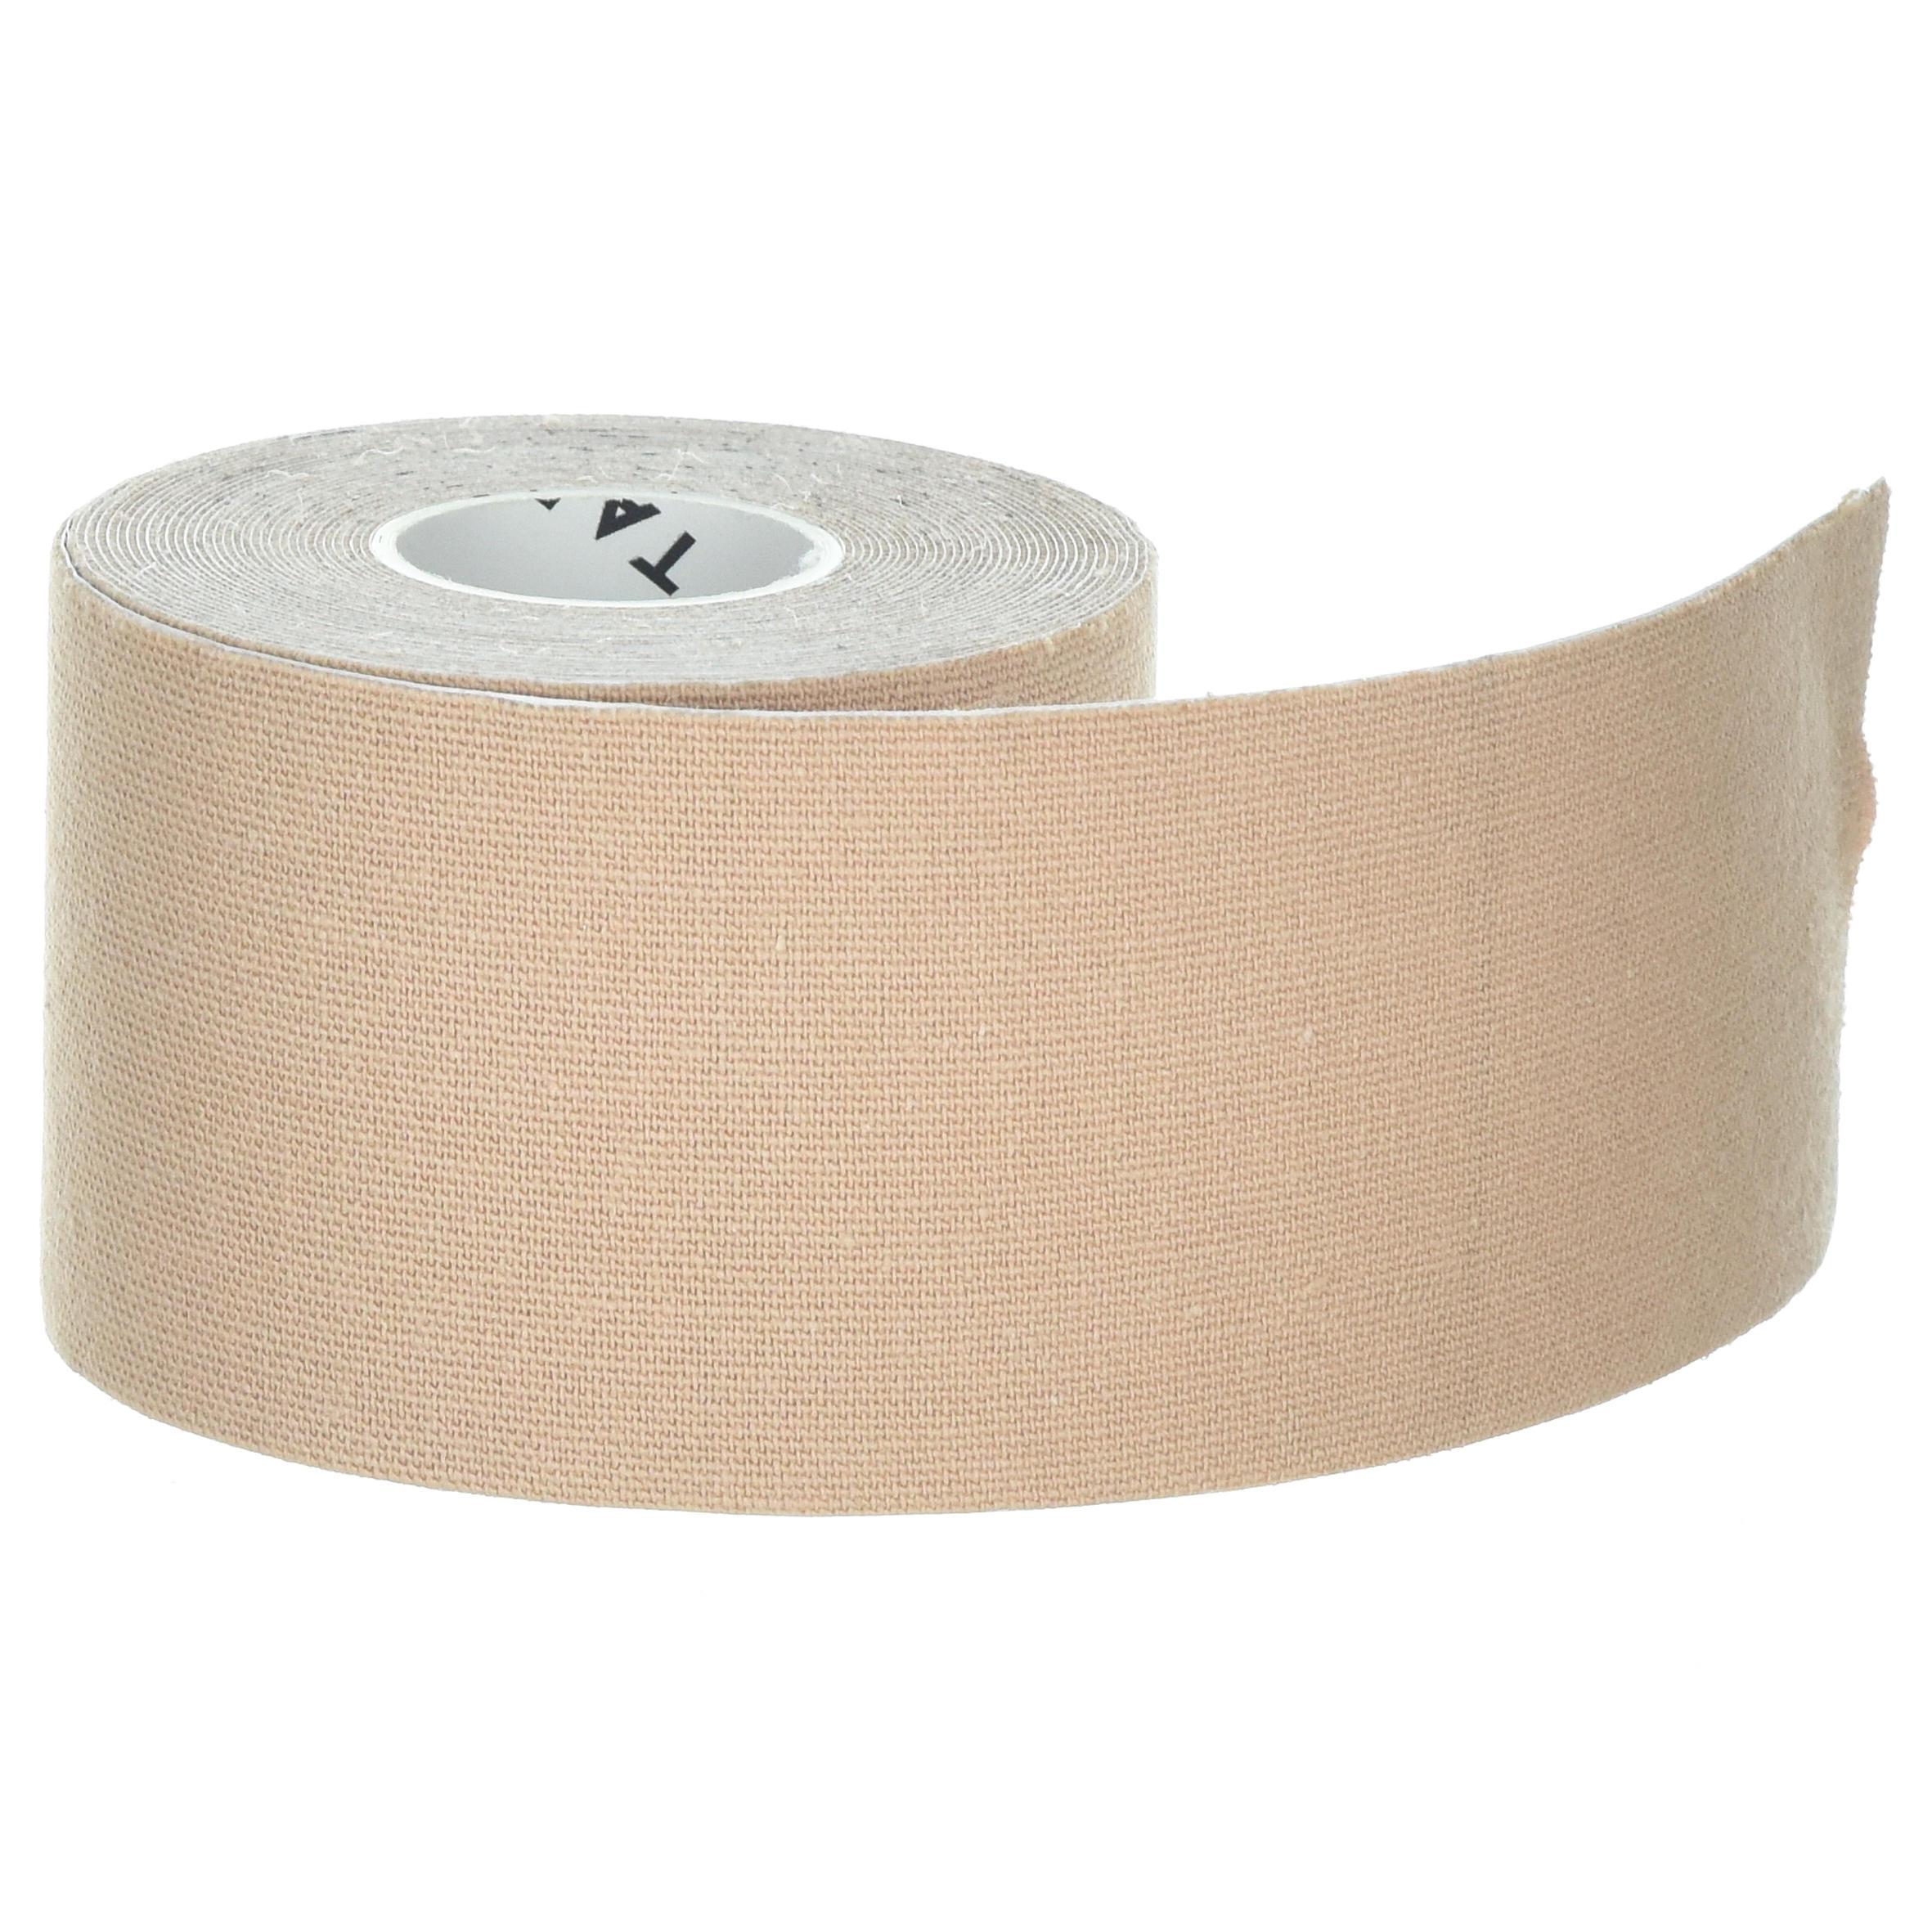 Kinesio Tape 5 cm x 5 m - Nude